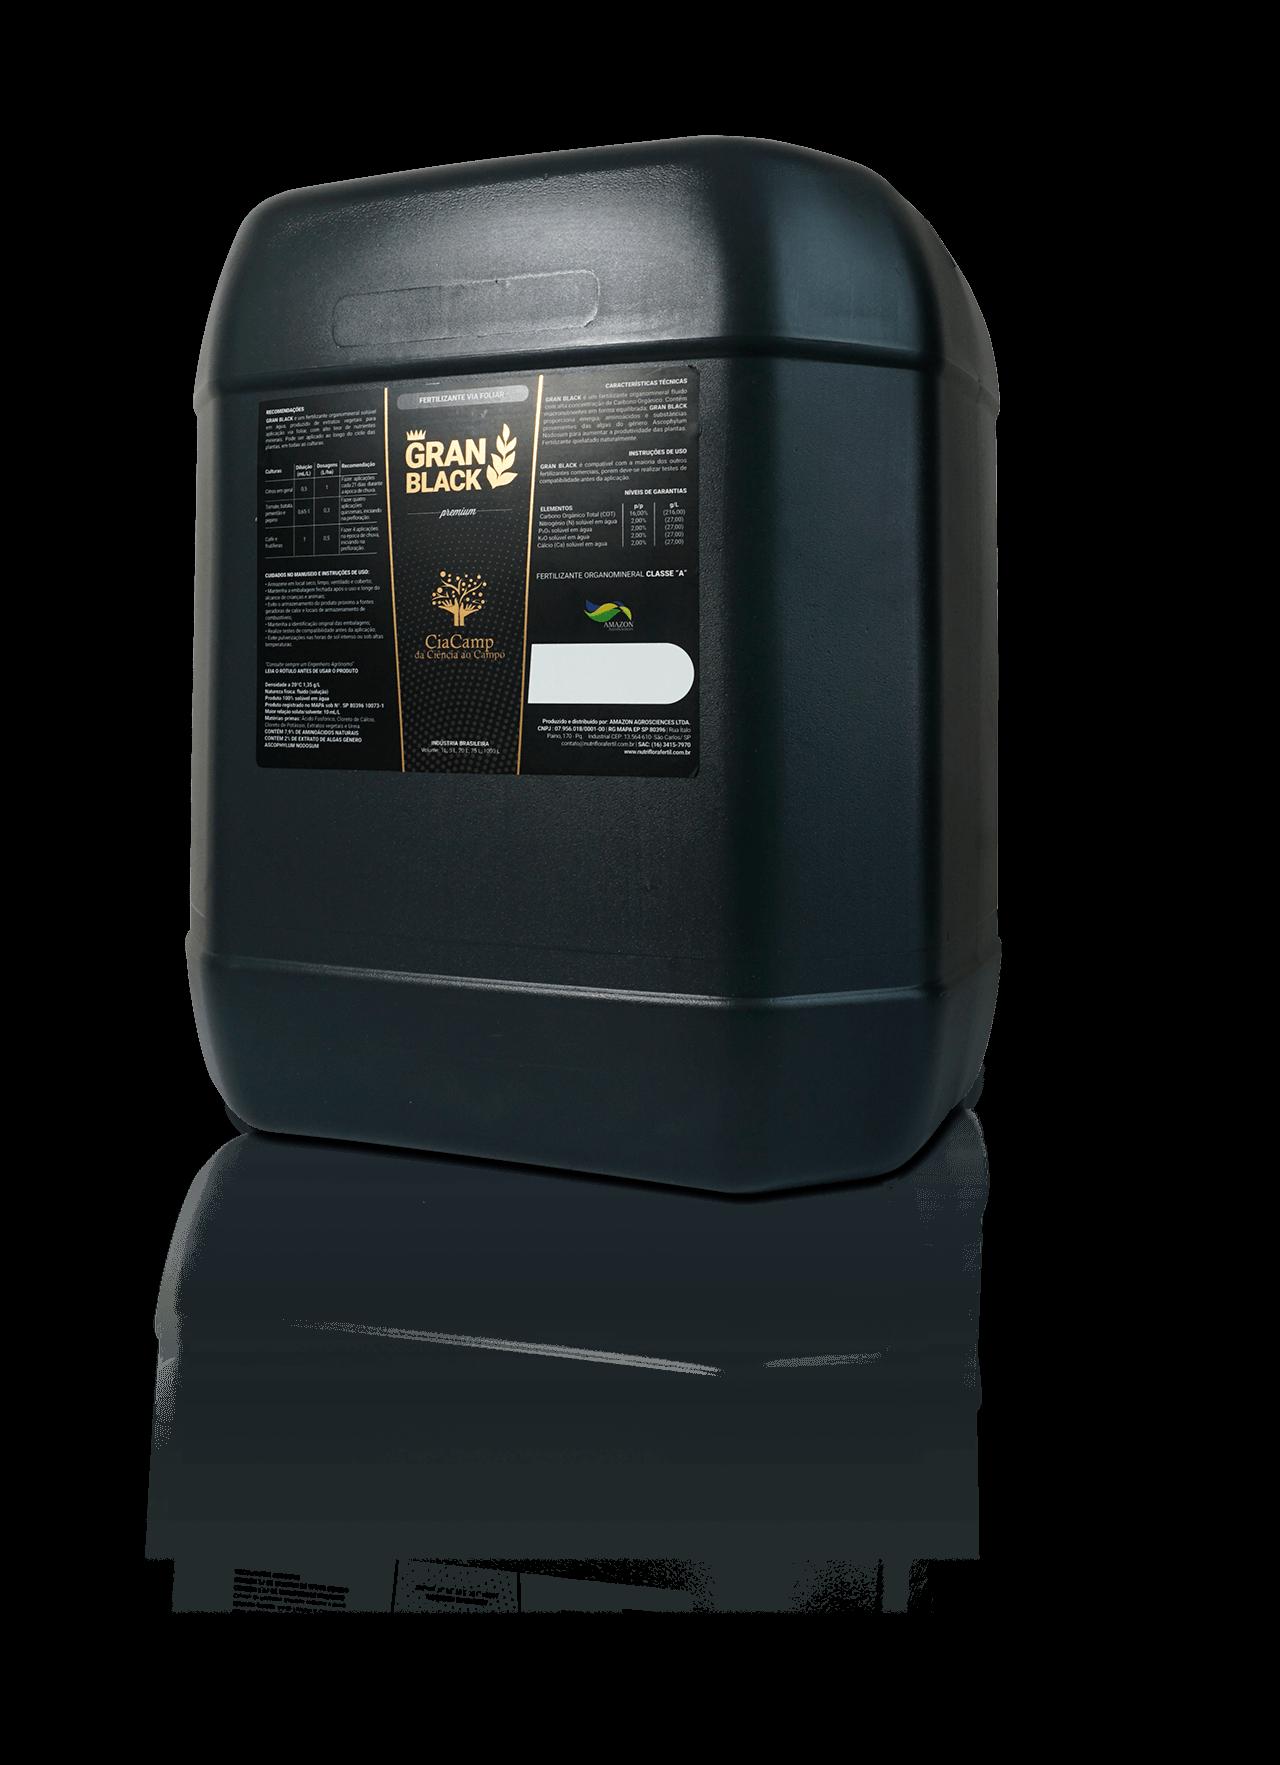 GRANBLACK Fertilizante Foliar Organomineral Premium Mockup Bomba de 20L do Produto Com Reflexo Versão 2